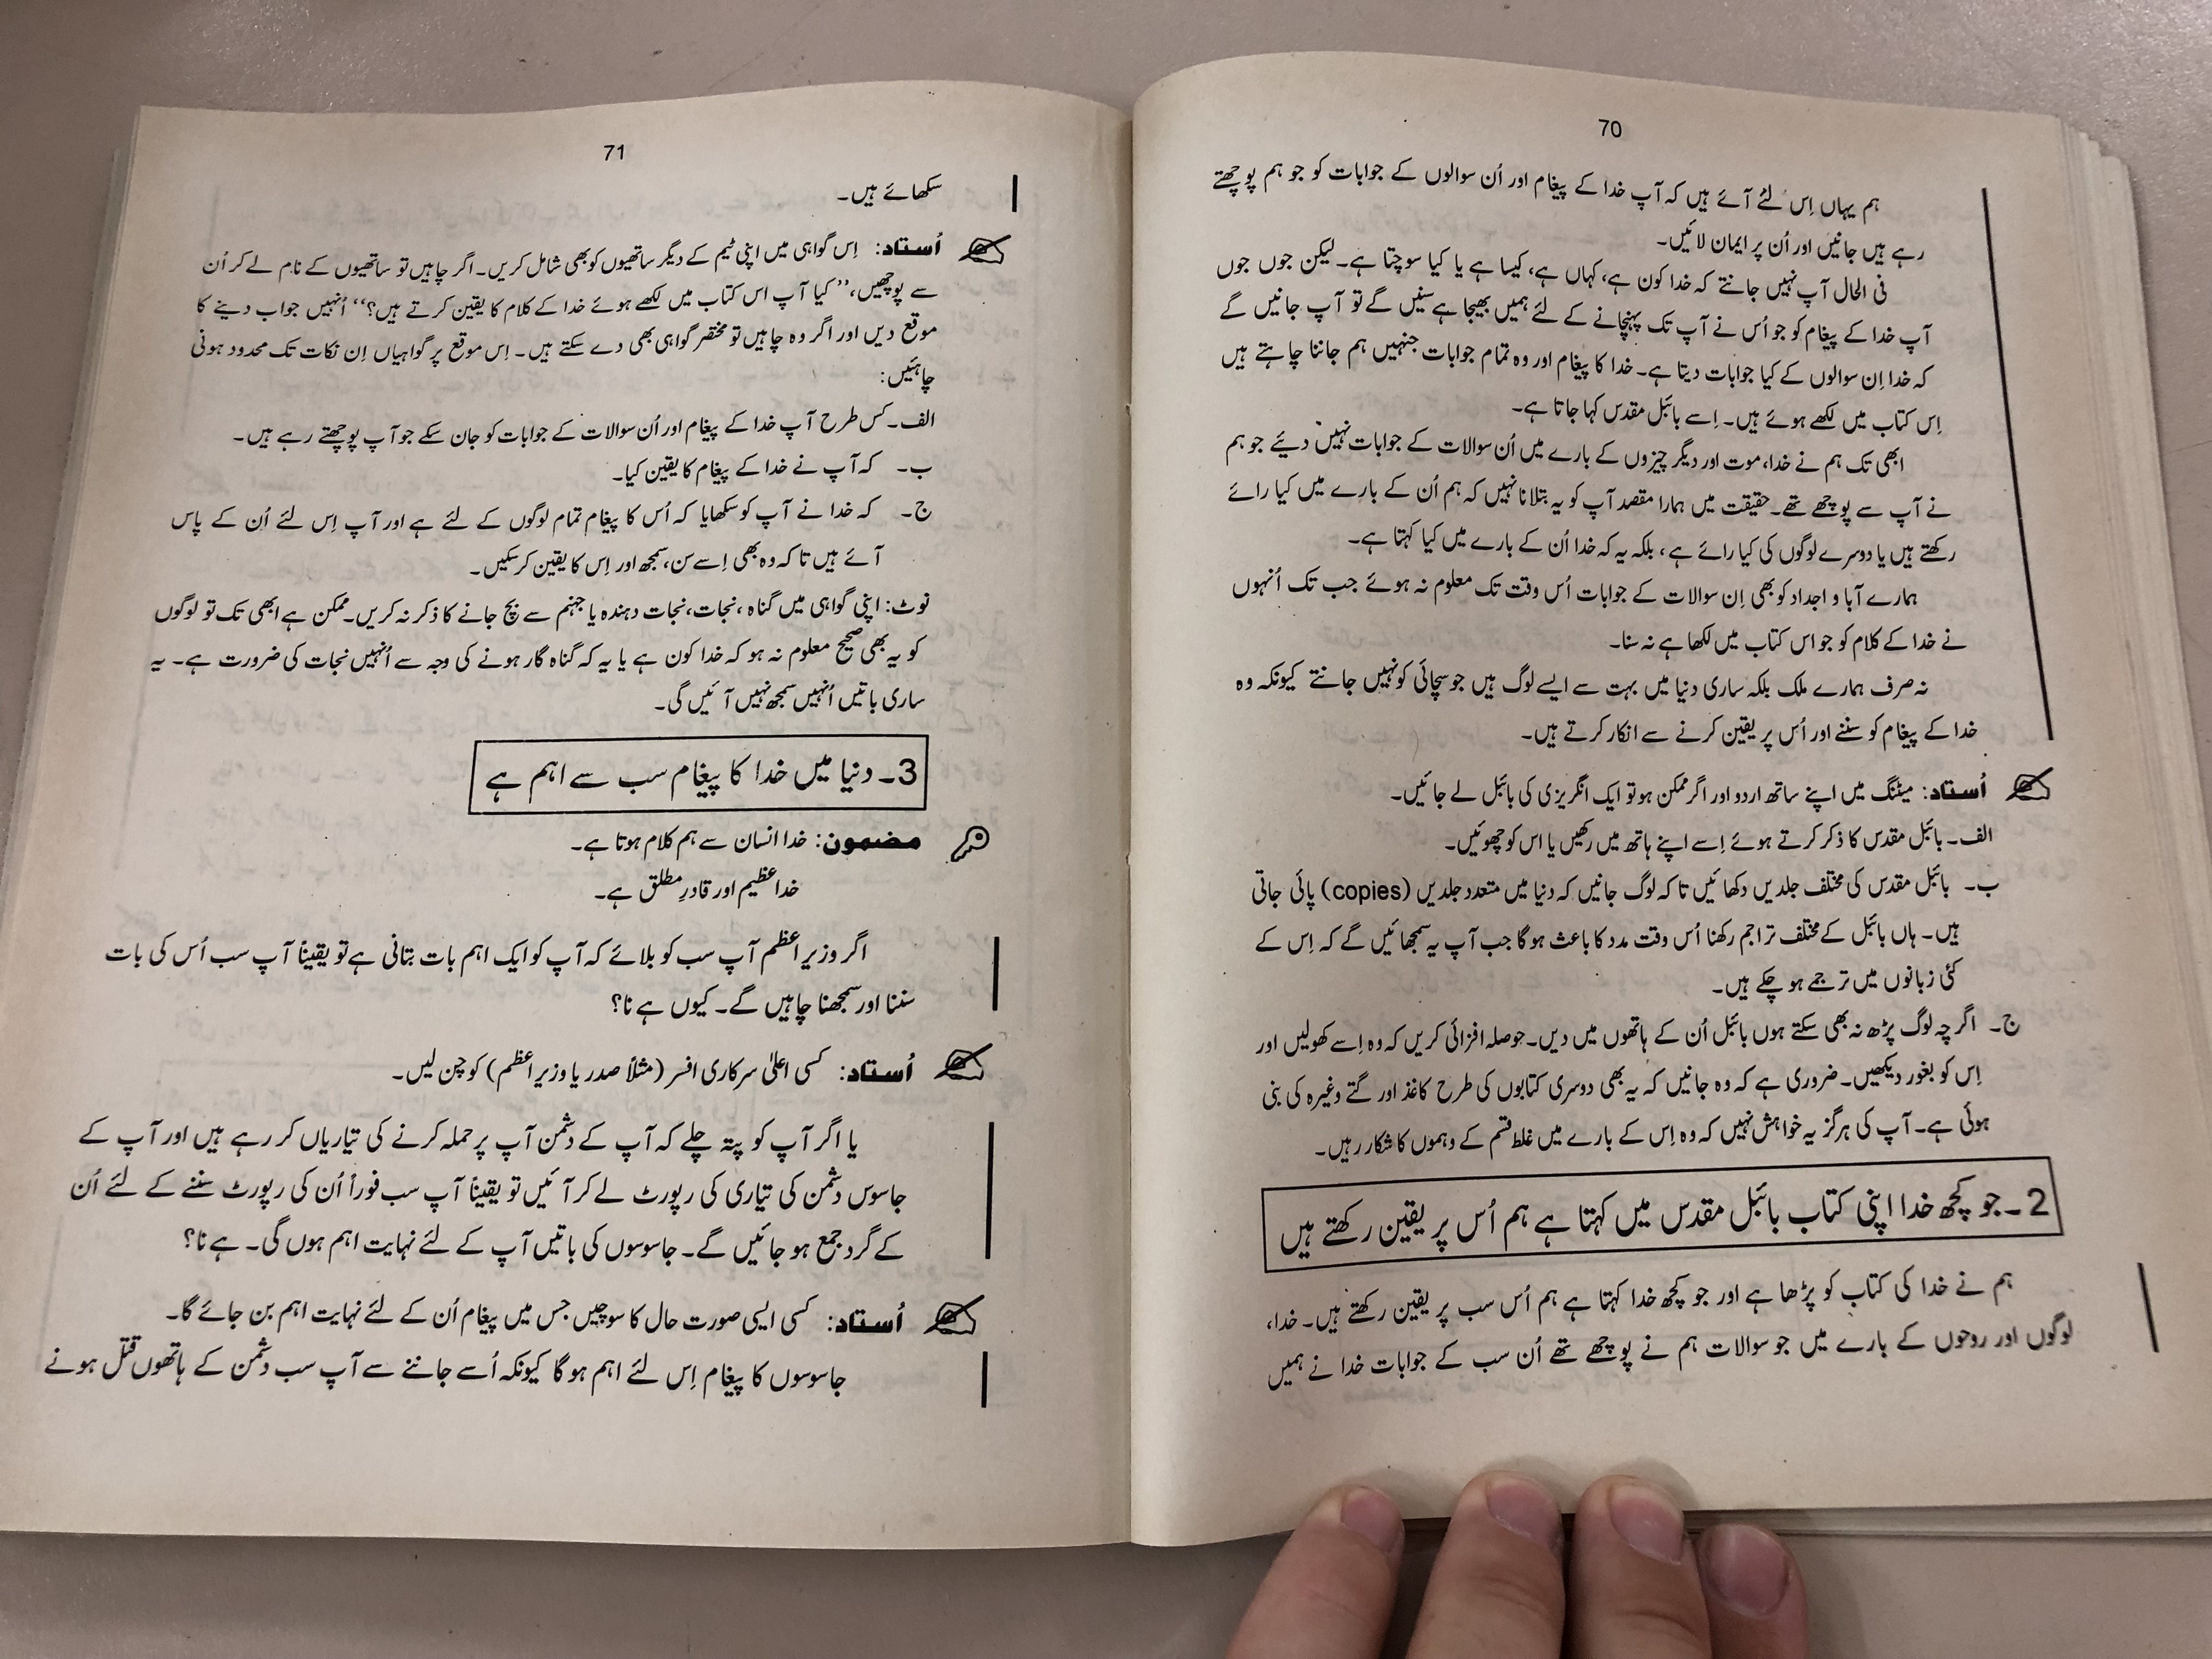 building-on-firm-foundations-vol.1-by-trevor-mcilwain-urdu-edition-evangelism-the-old-testament-pakistan-2007-6-.jpg